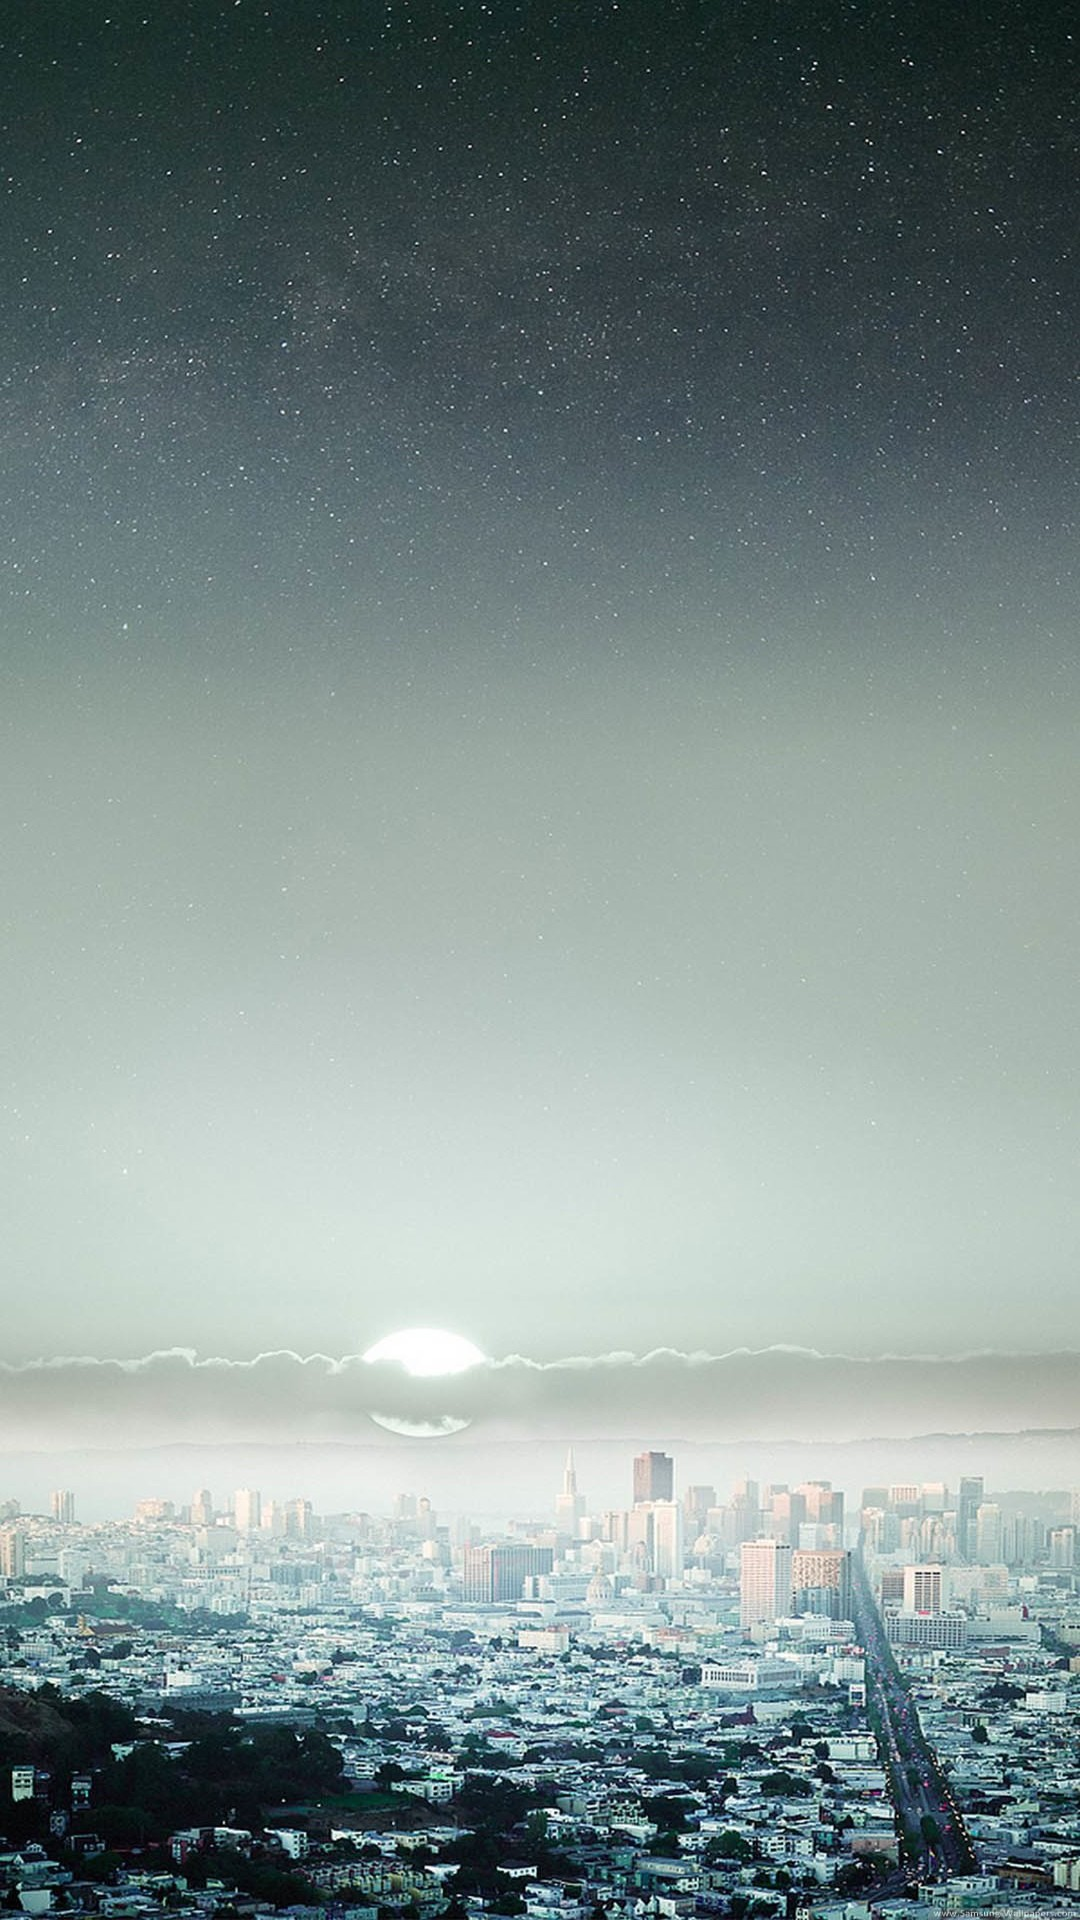 Starry Night Sky Big City iPhone 6 Plus HD Wallpaper / iPod Wallpaper .